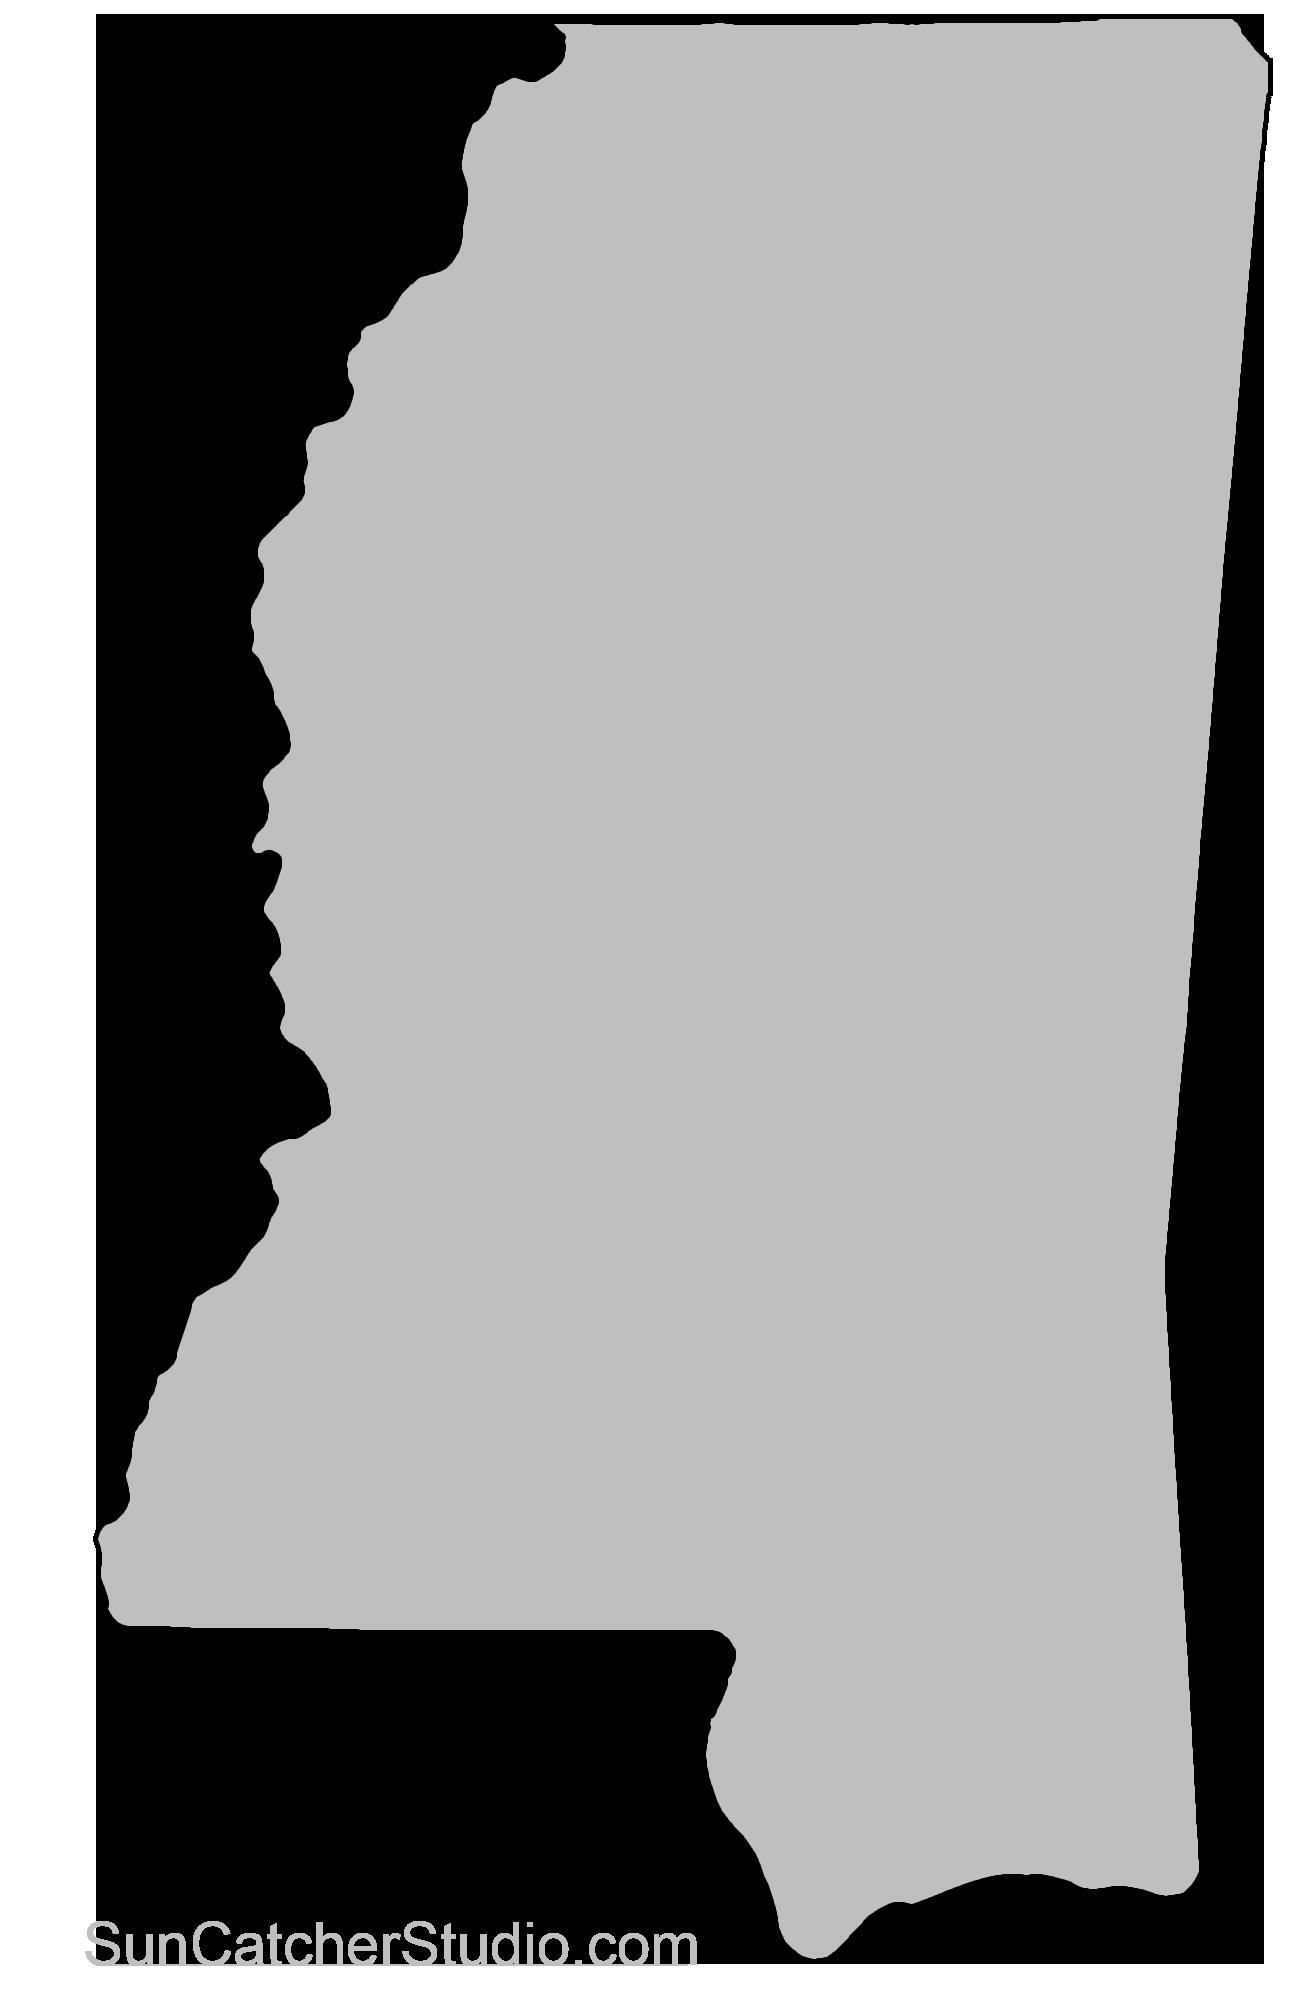 Mississippi State Map Outline.Mississippi Map Outline Printable State Shape Stencil Pattern